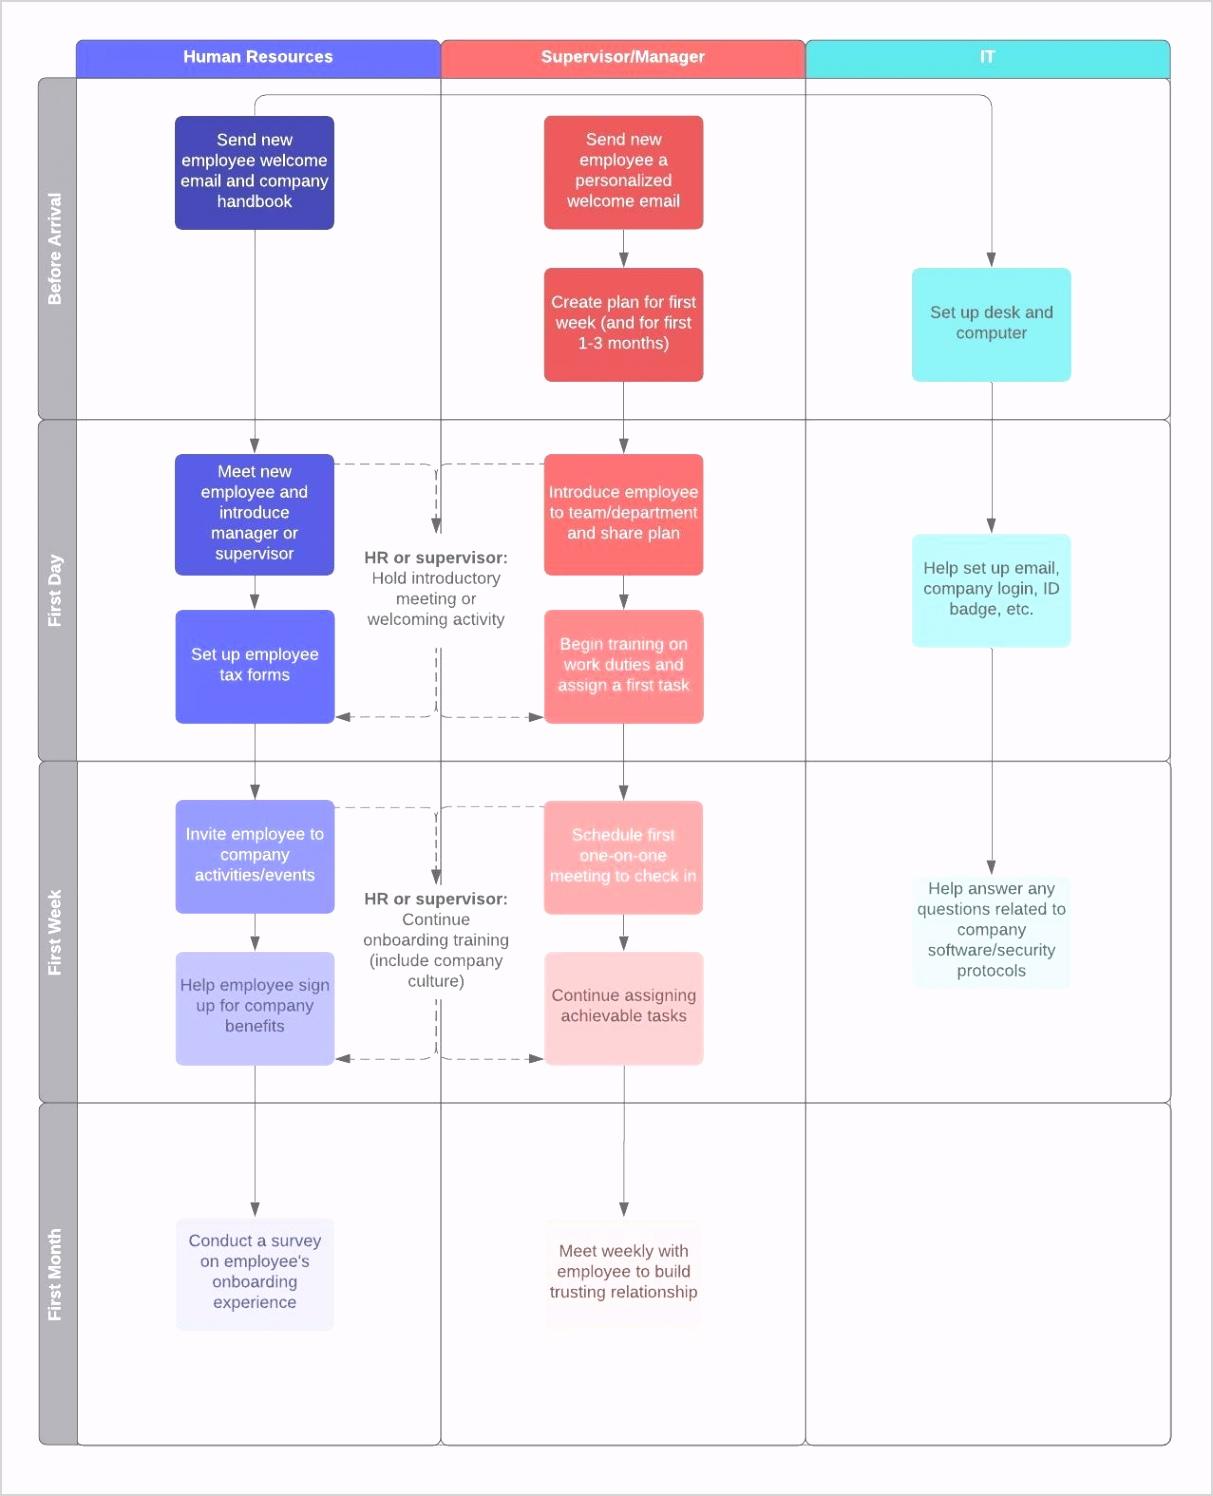 New Employee Orientation Process Flow